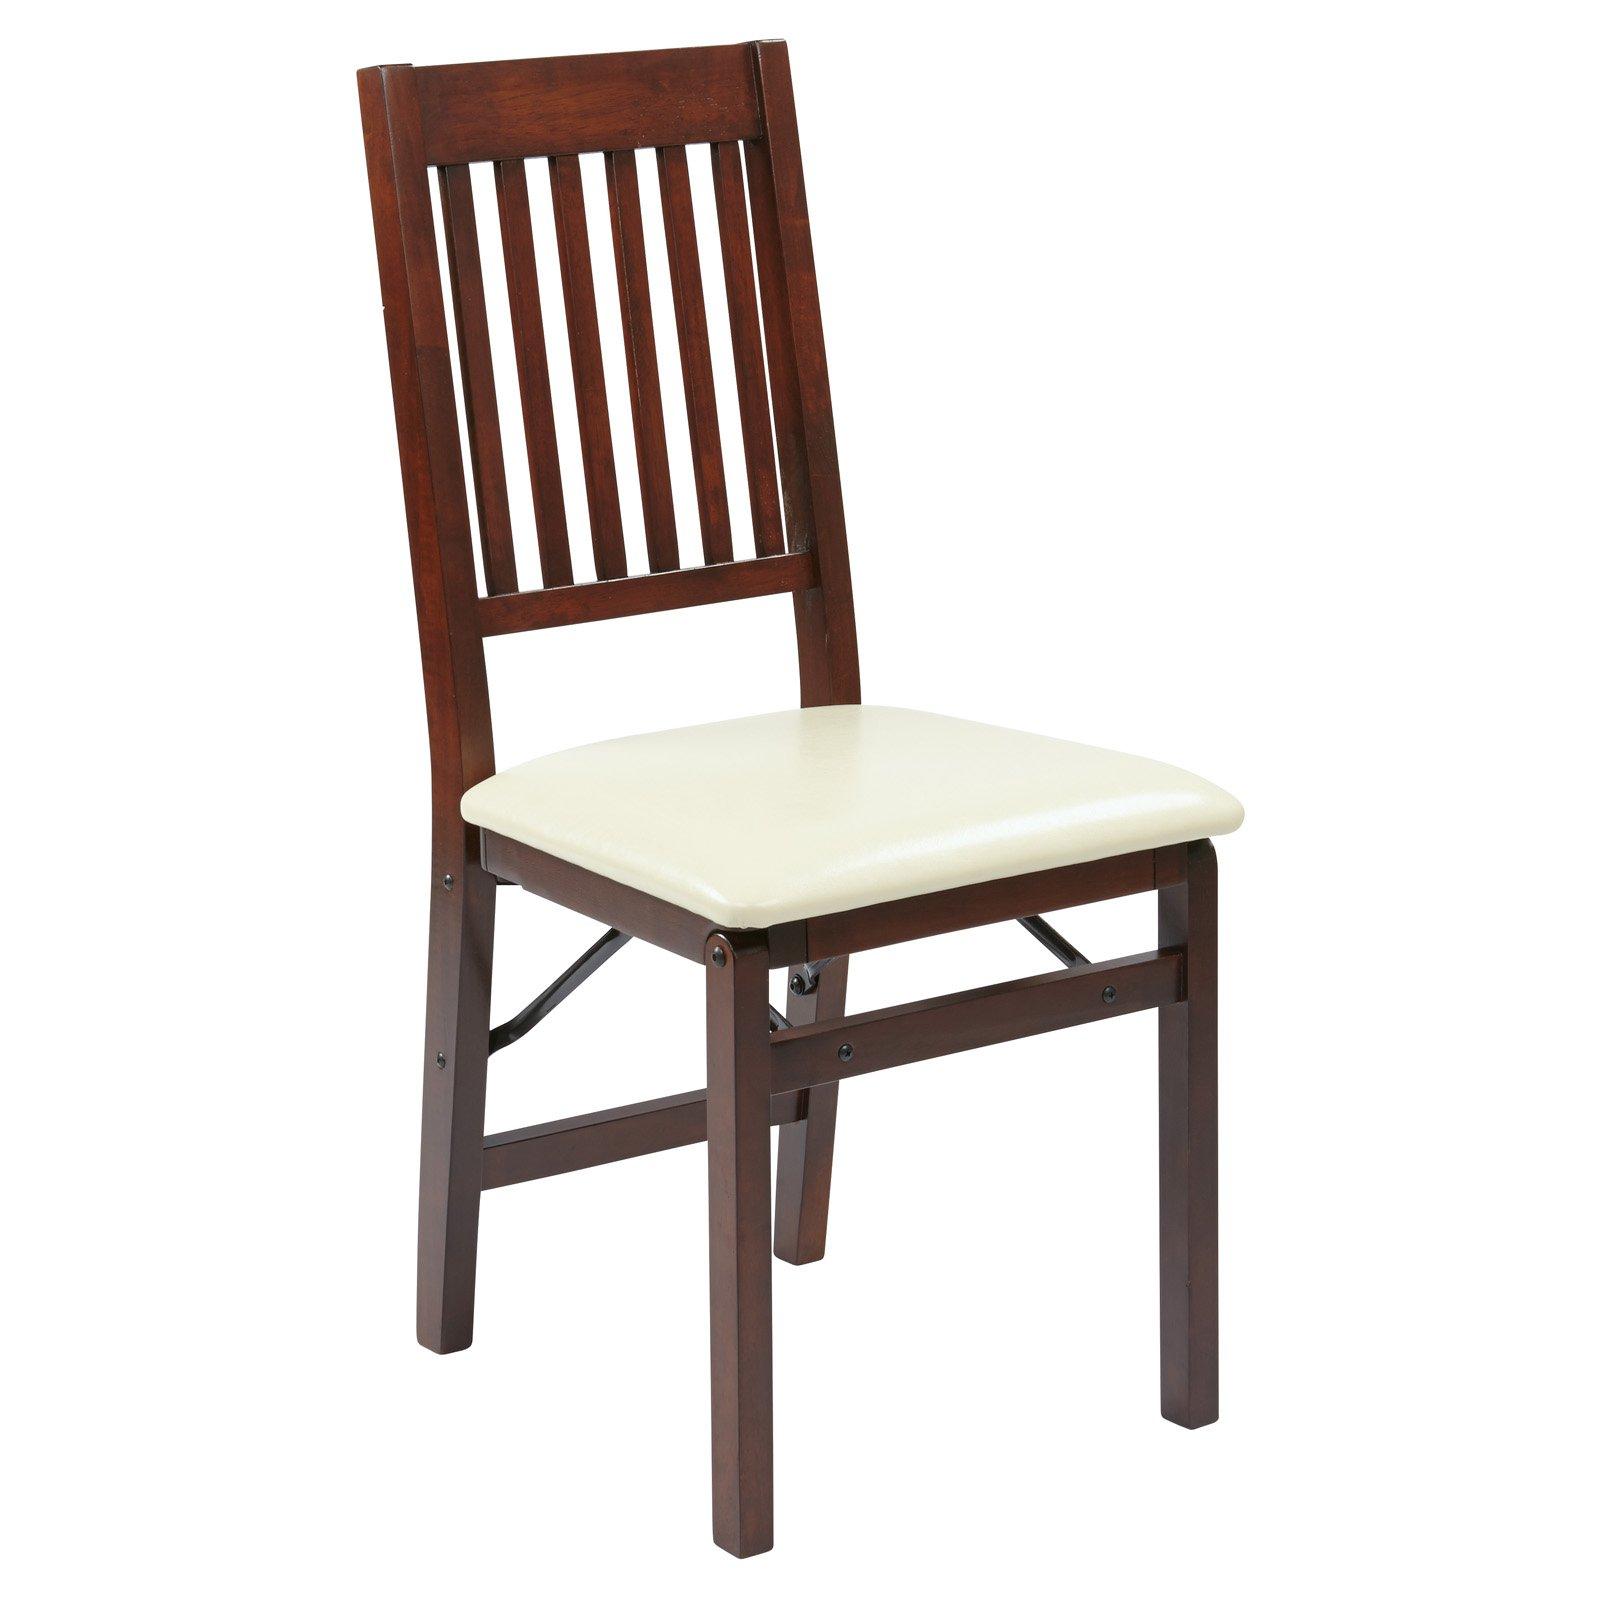 Hacienda Mission Back Folding Chair 2-Pack, Cream